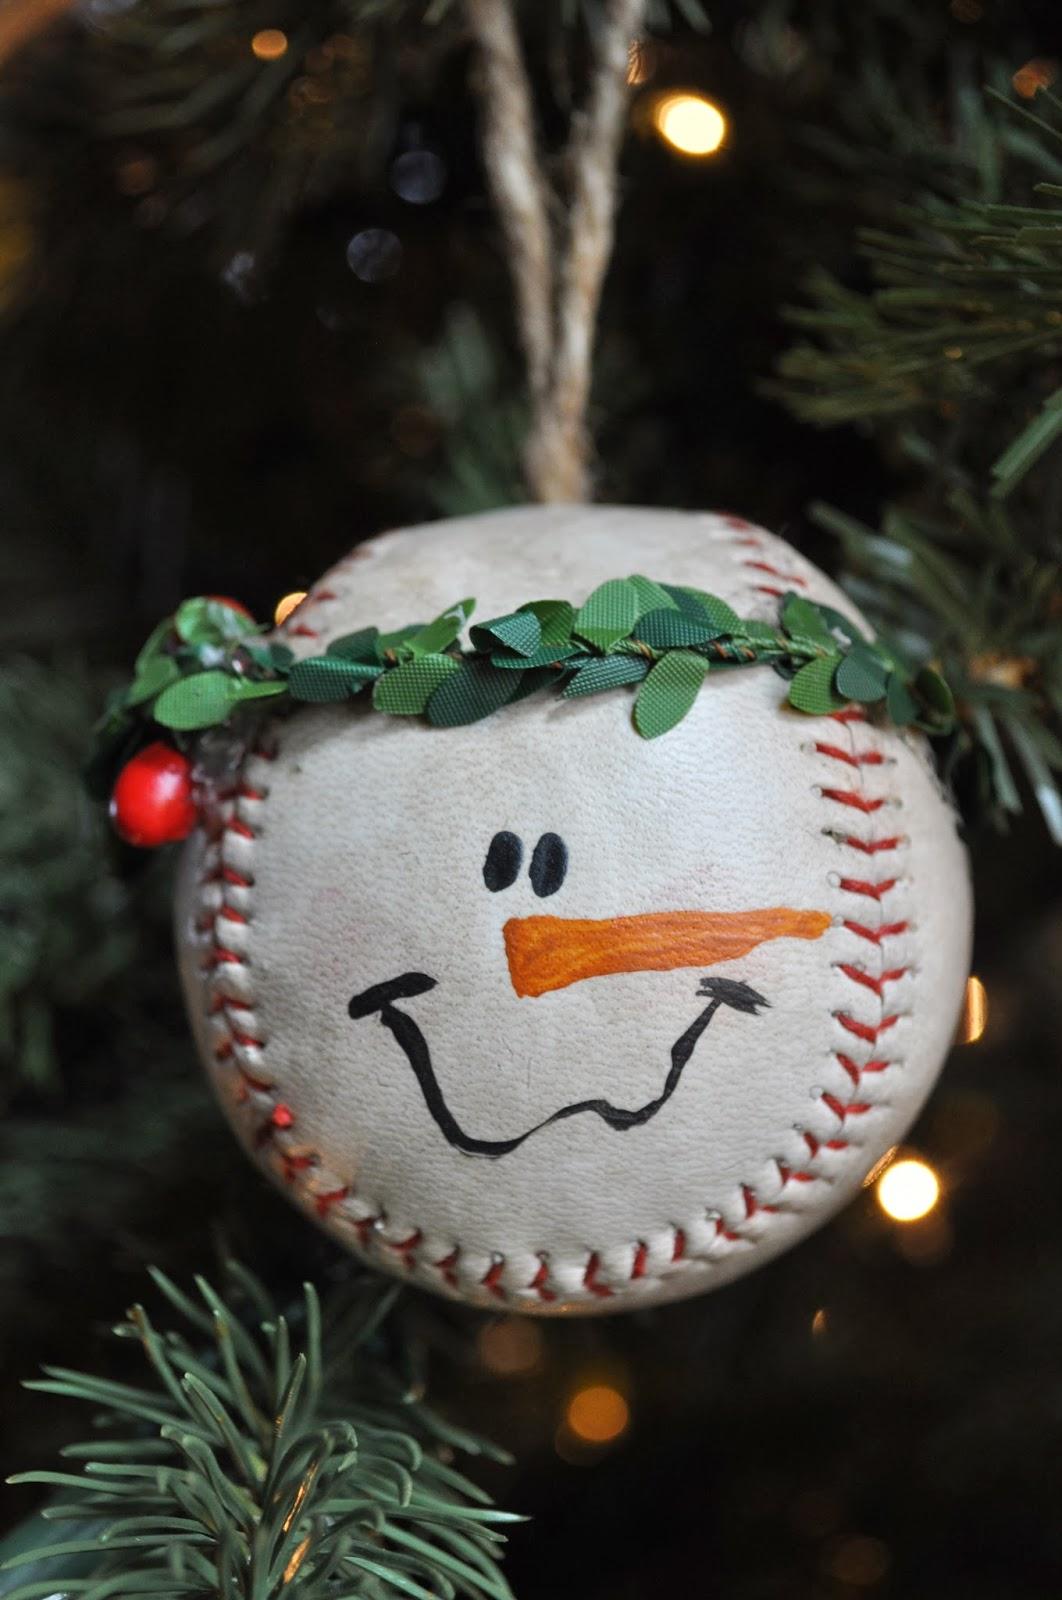 Snowman face ornament - Baseball Snowman Ornament